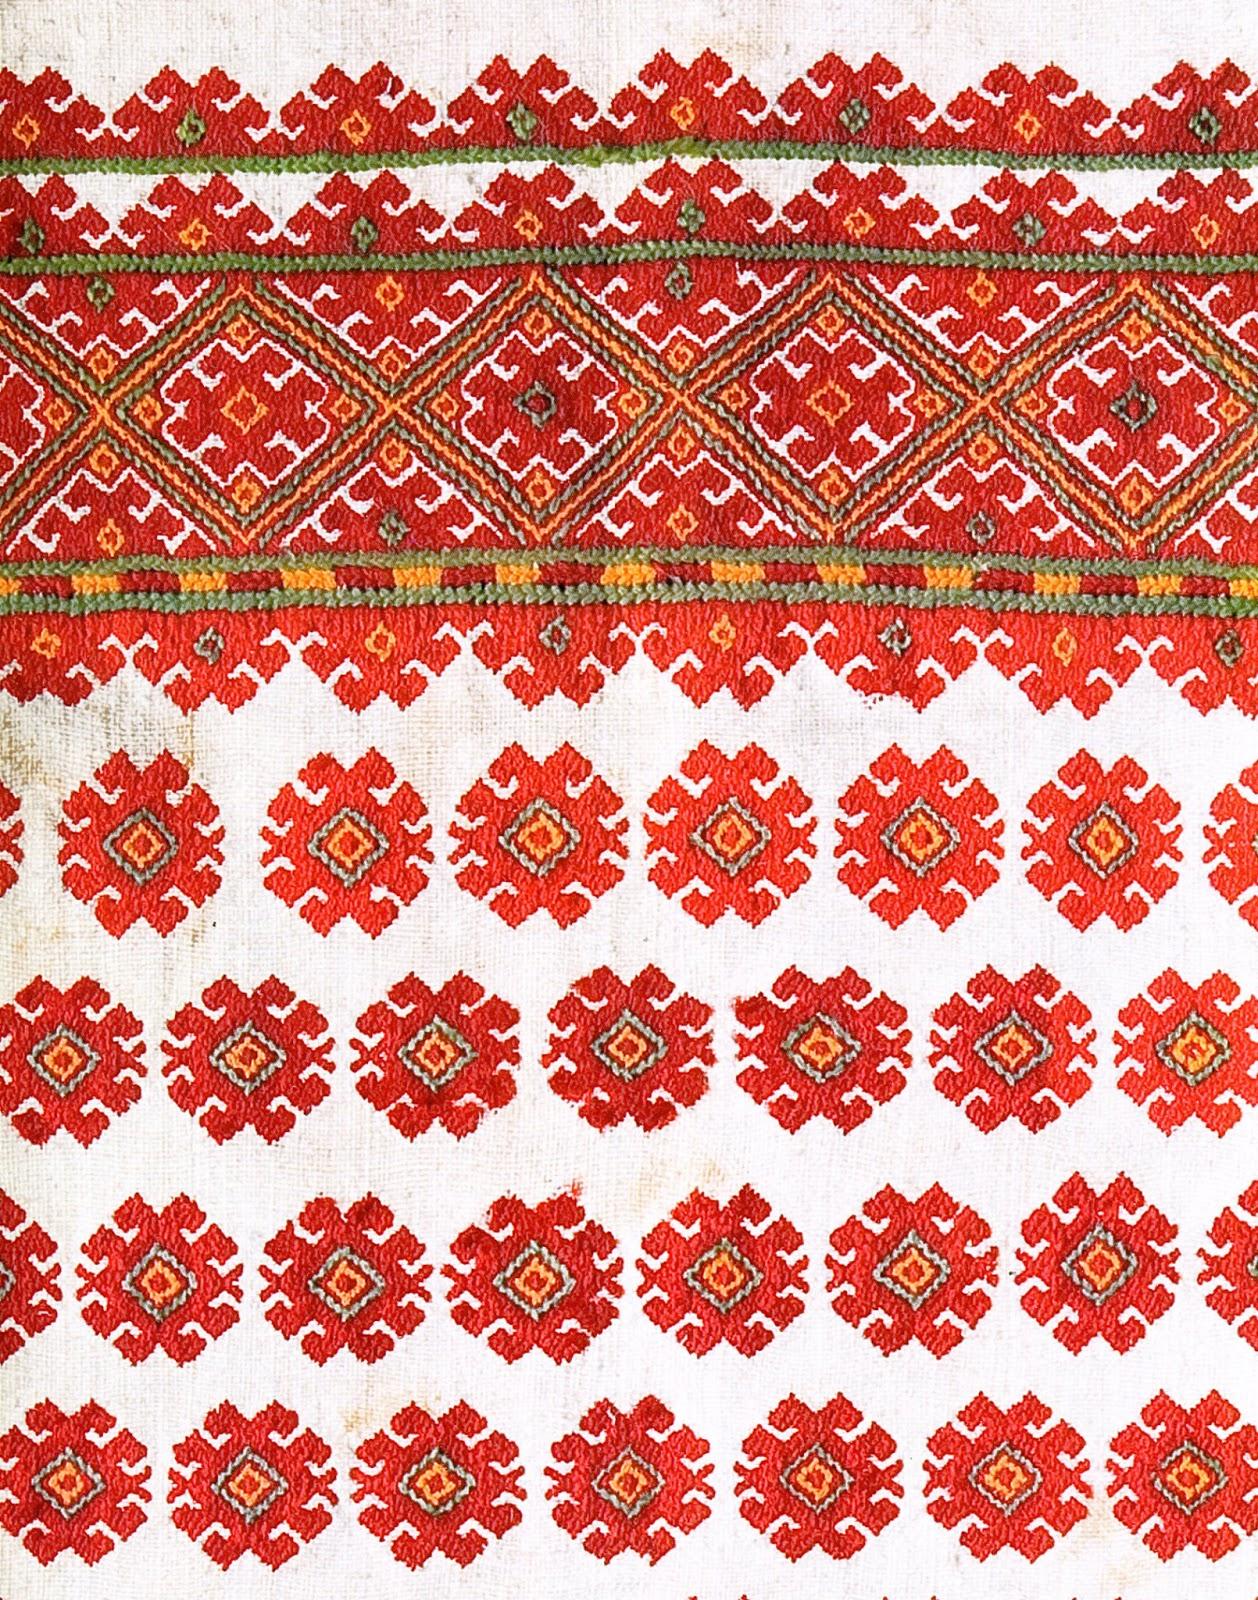 Folkcostume embroidery nyzynka of western ukraine